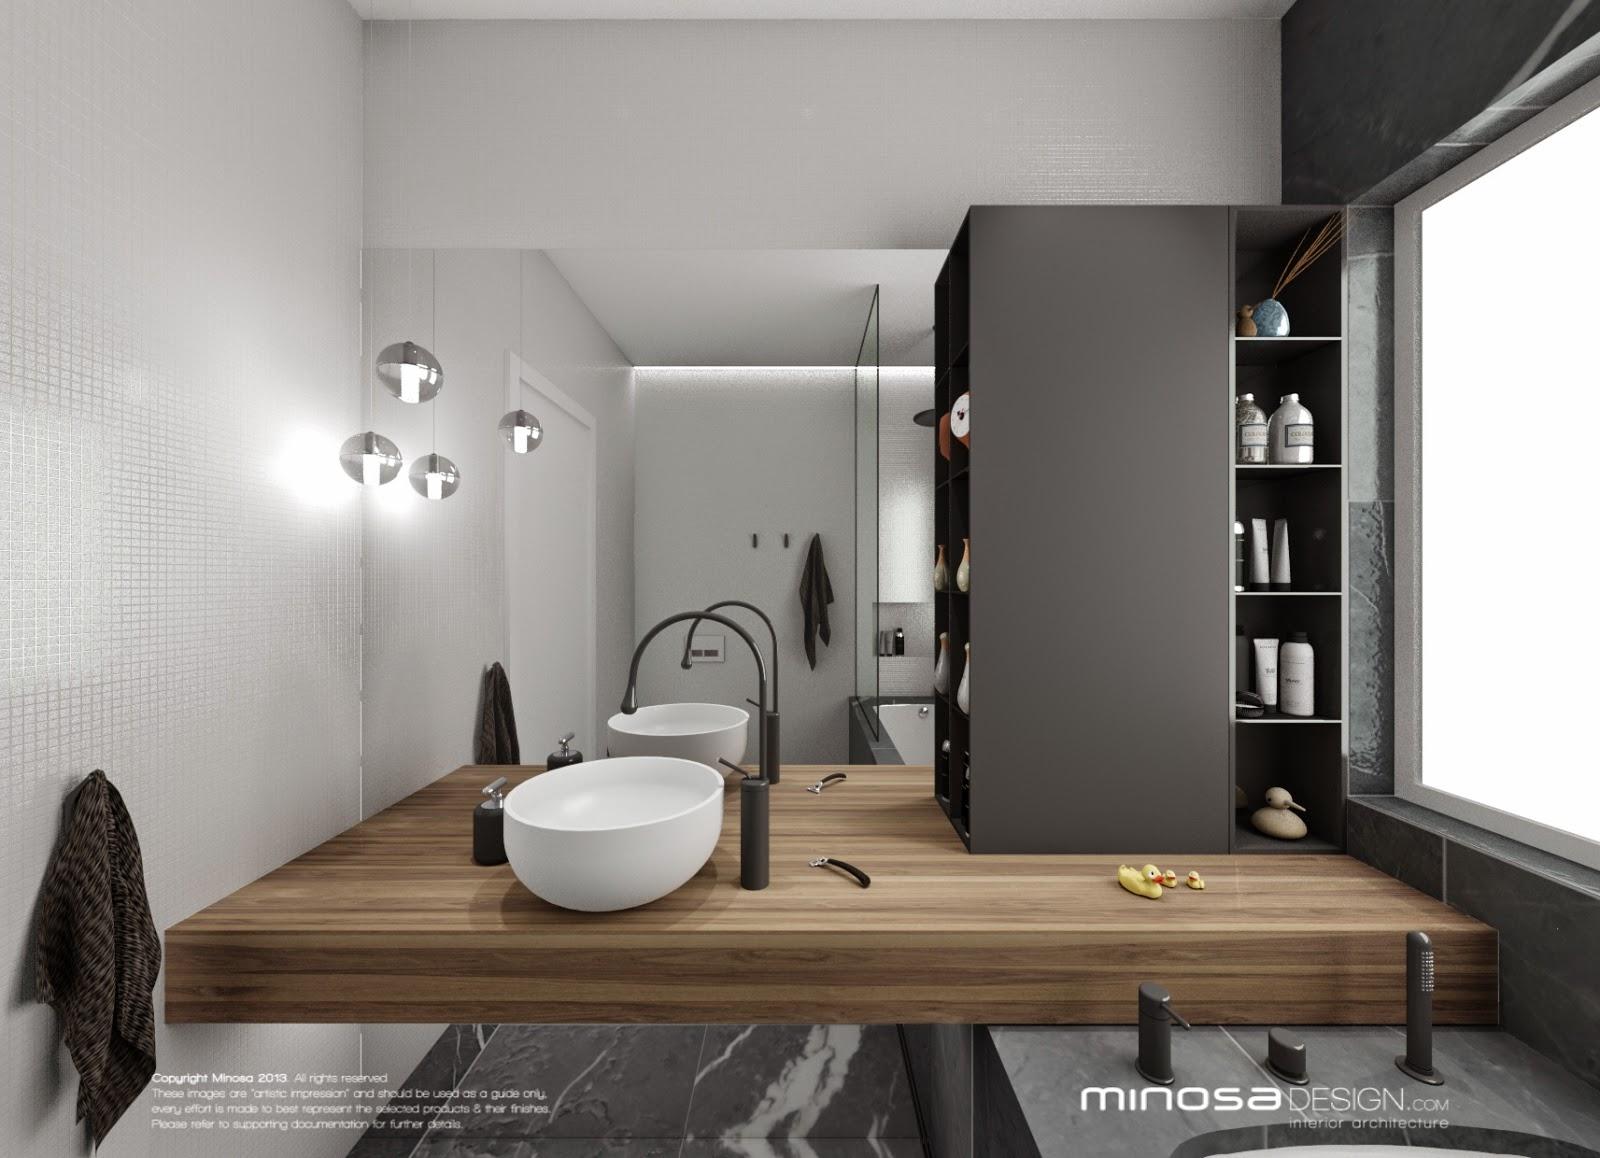 Minosa: Bathroom Design - Small space feels large on Bathroom Design In Small Space  id=19979